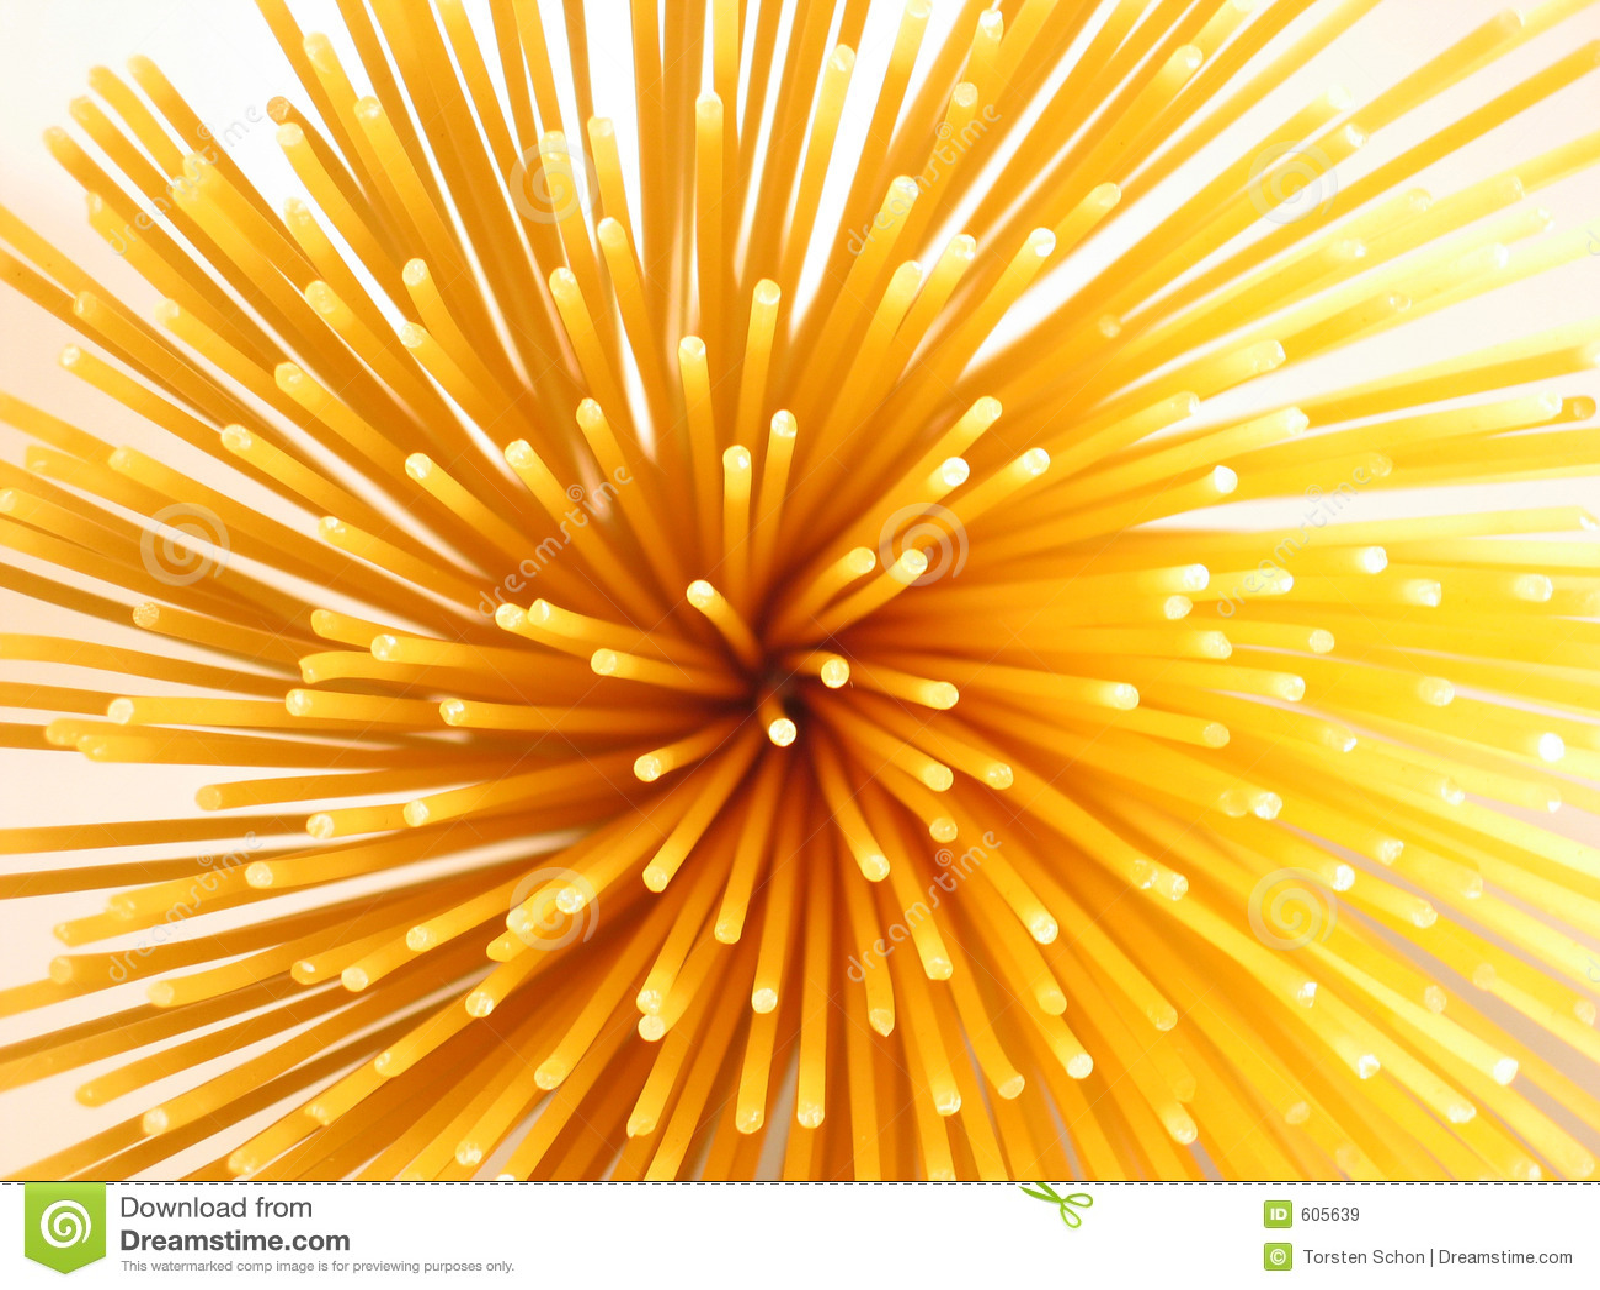 Stekelige spaghetti